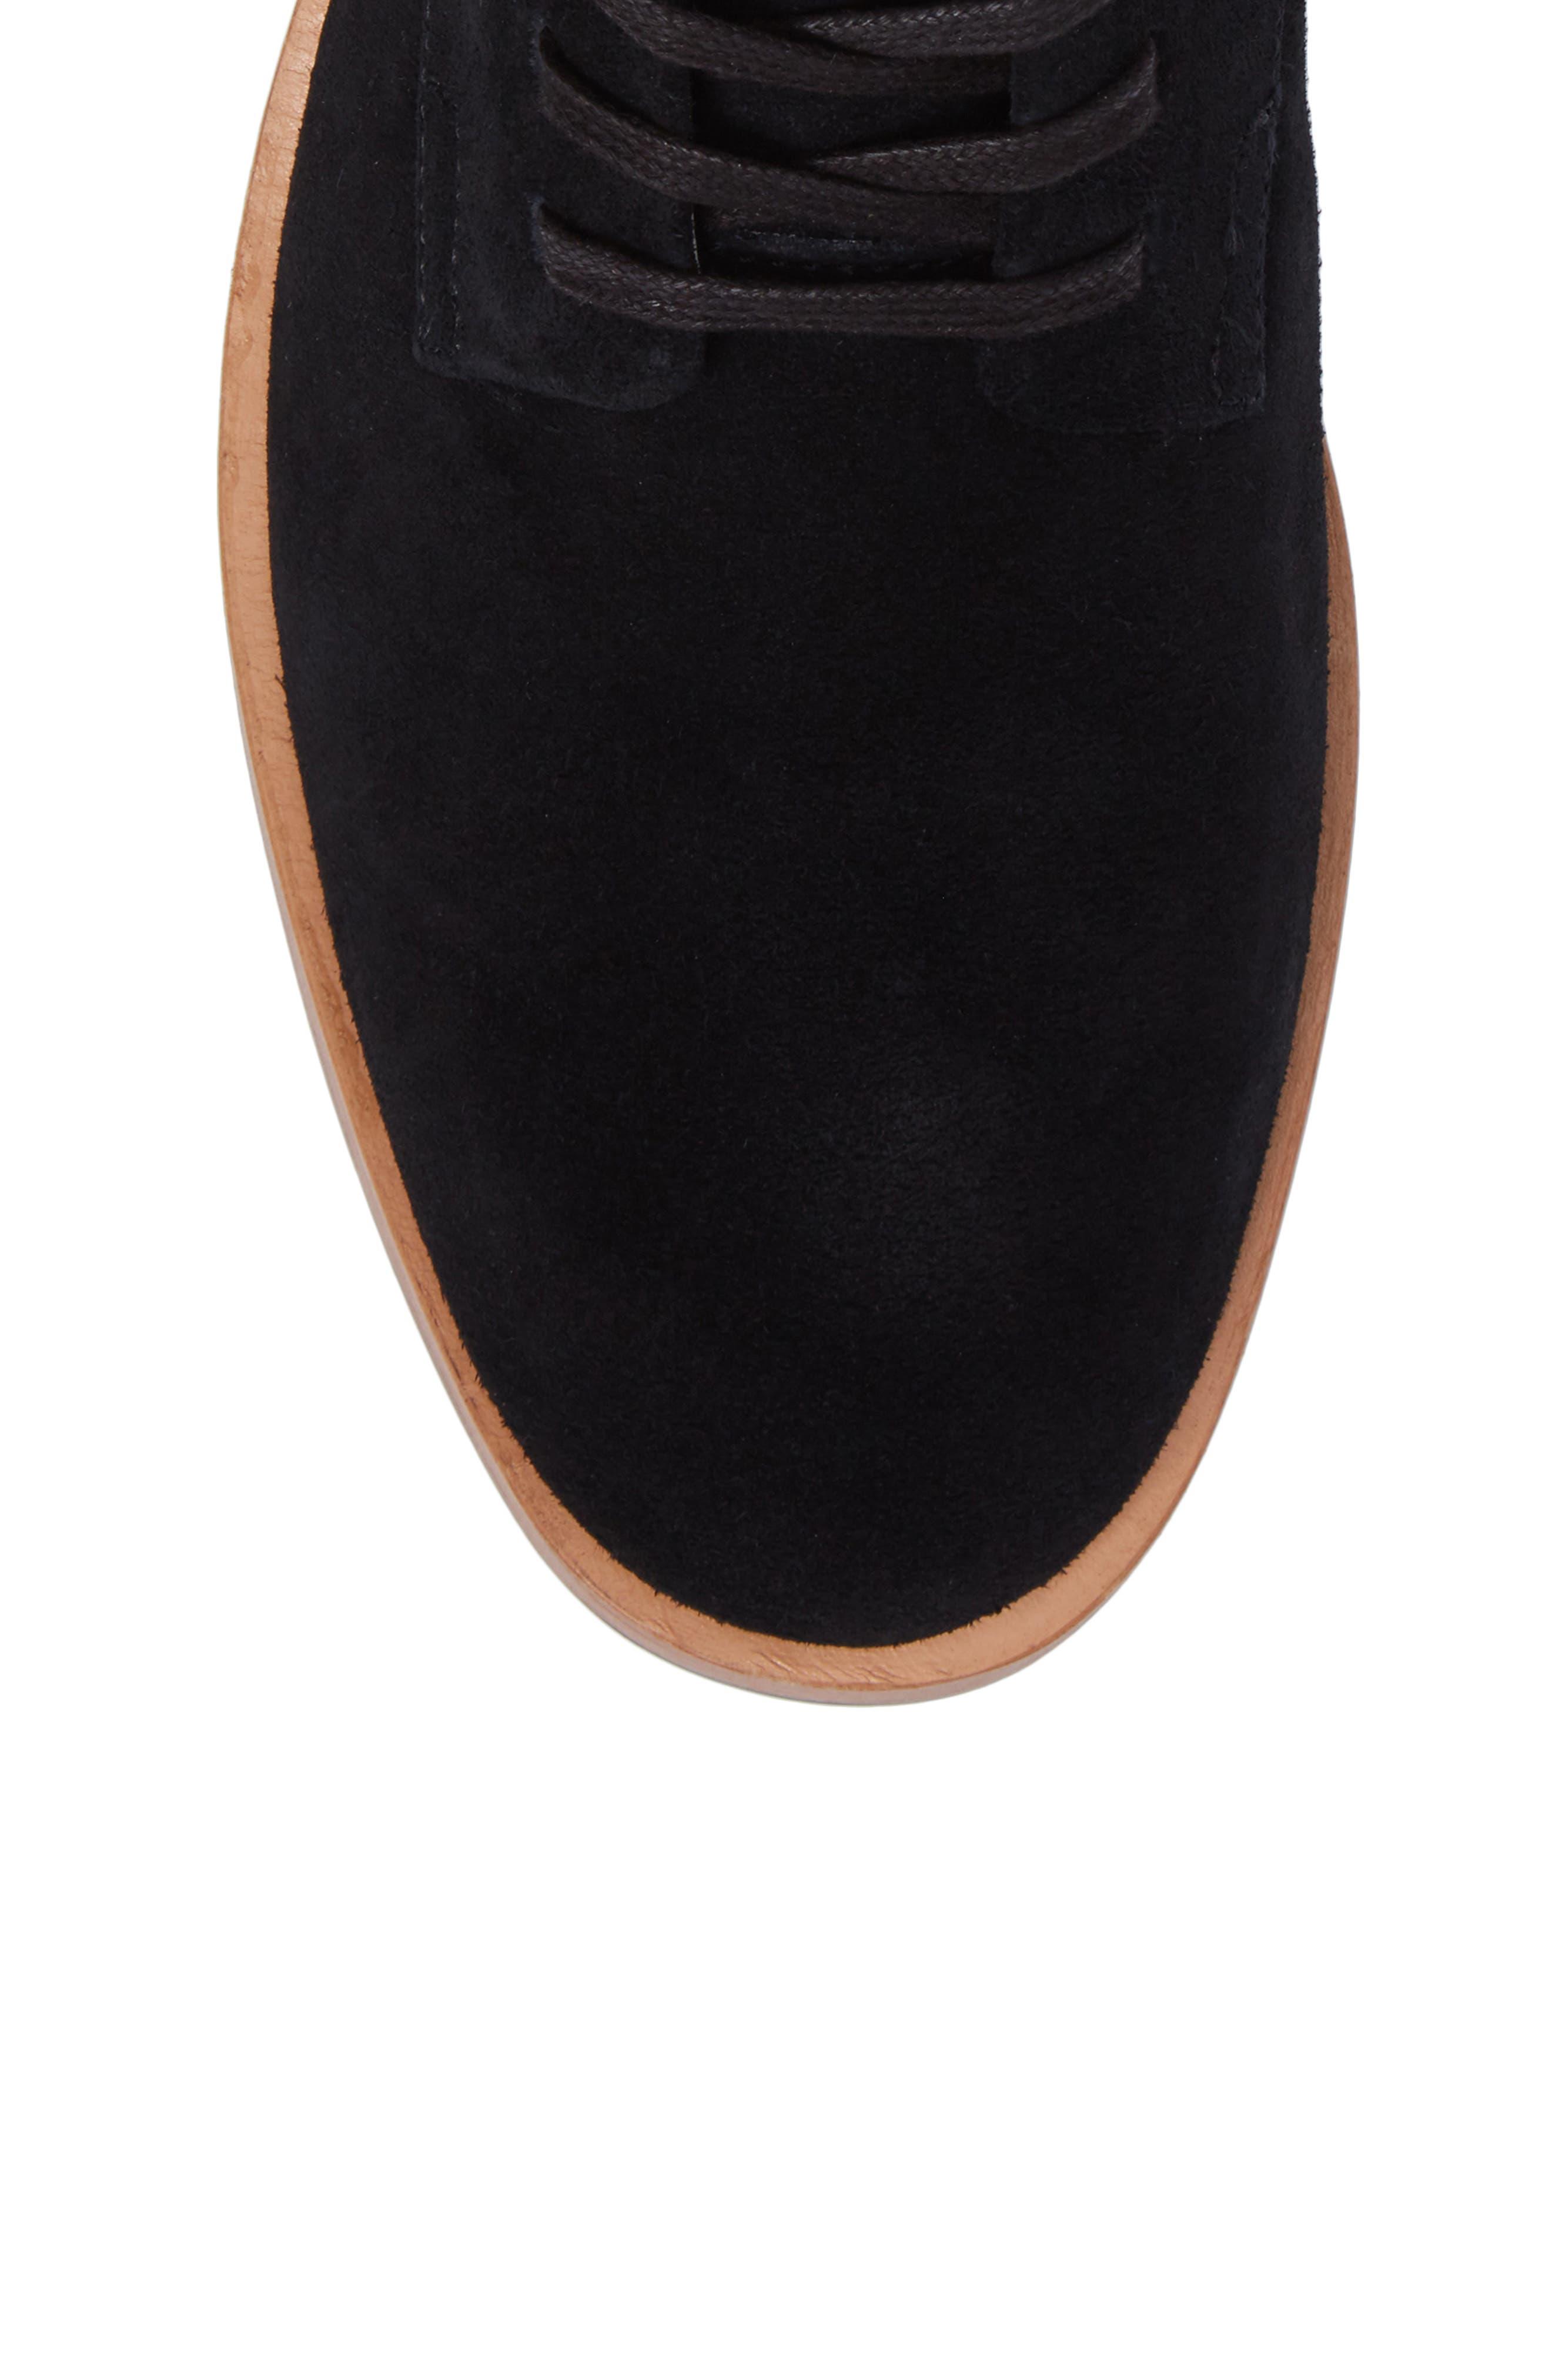 Radburn Plain Toe Boot,                             Alternate thumbnail 5, color,                             001